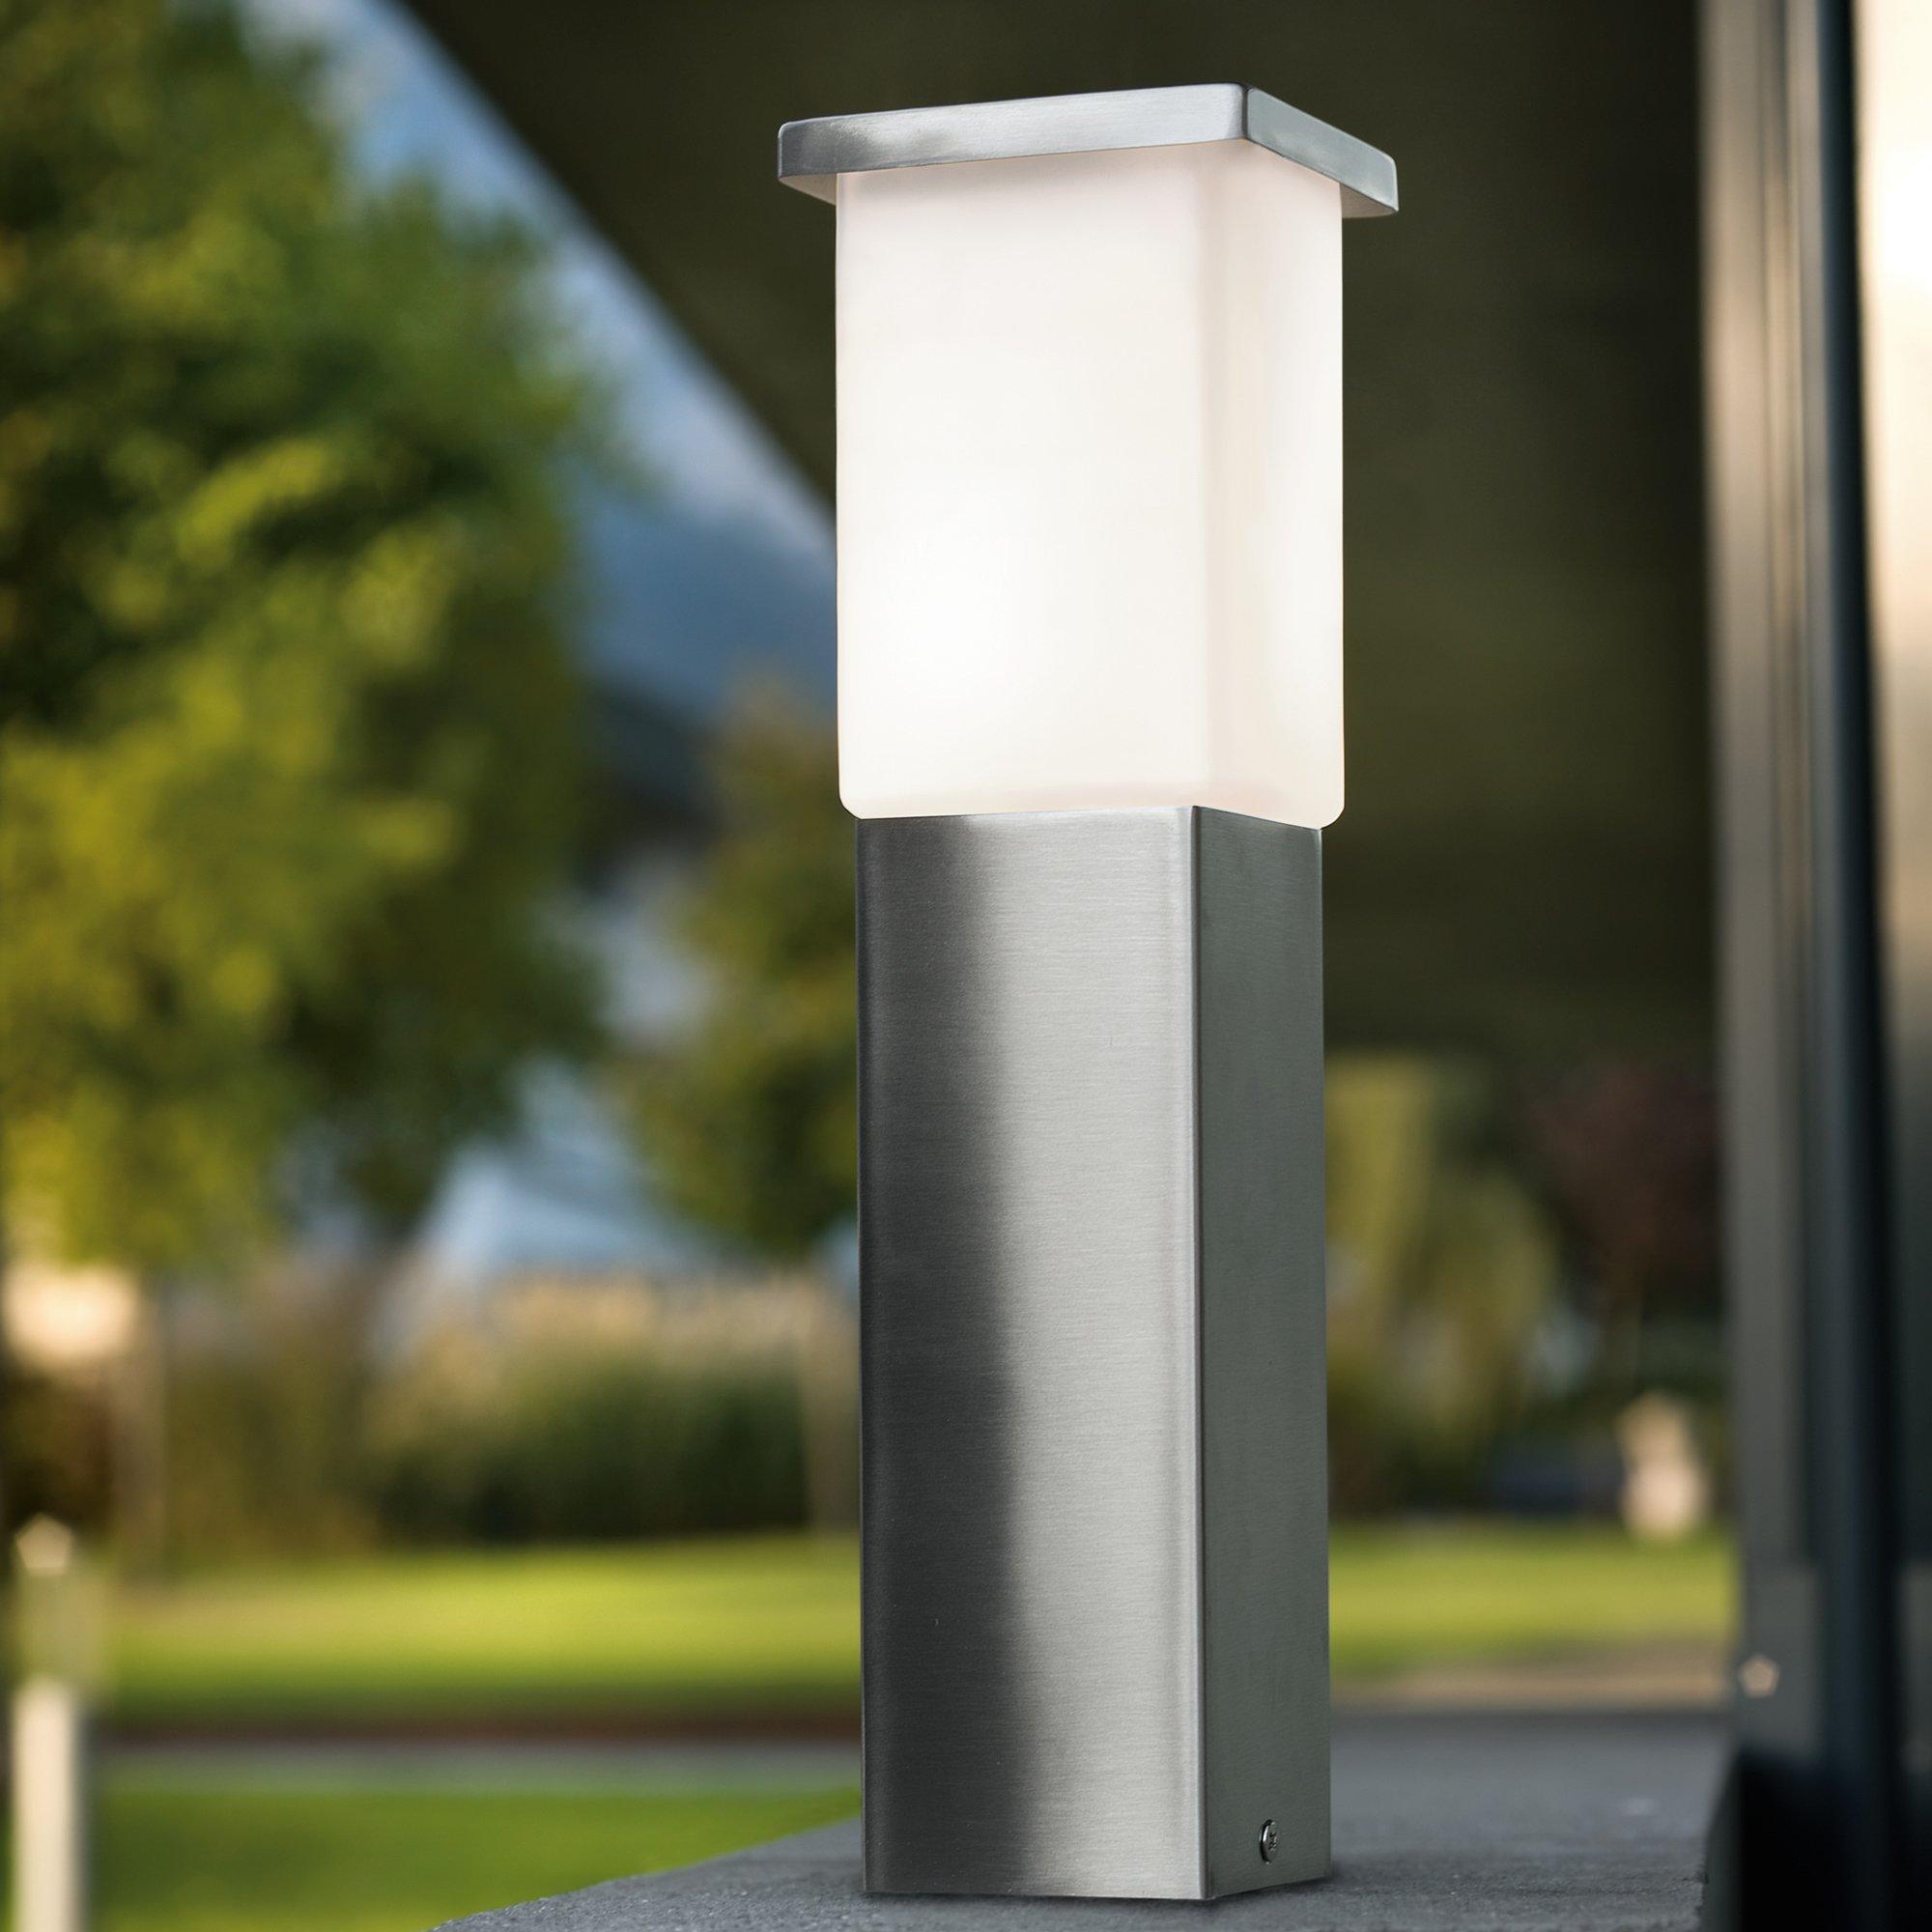 Venkovní lampa/sloupek EGLO 86388 (CALGARY)